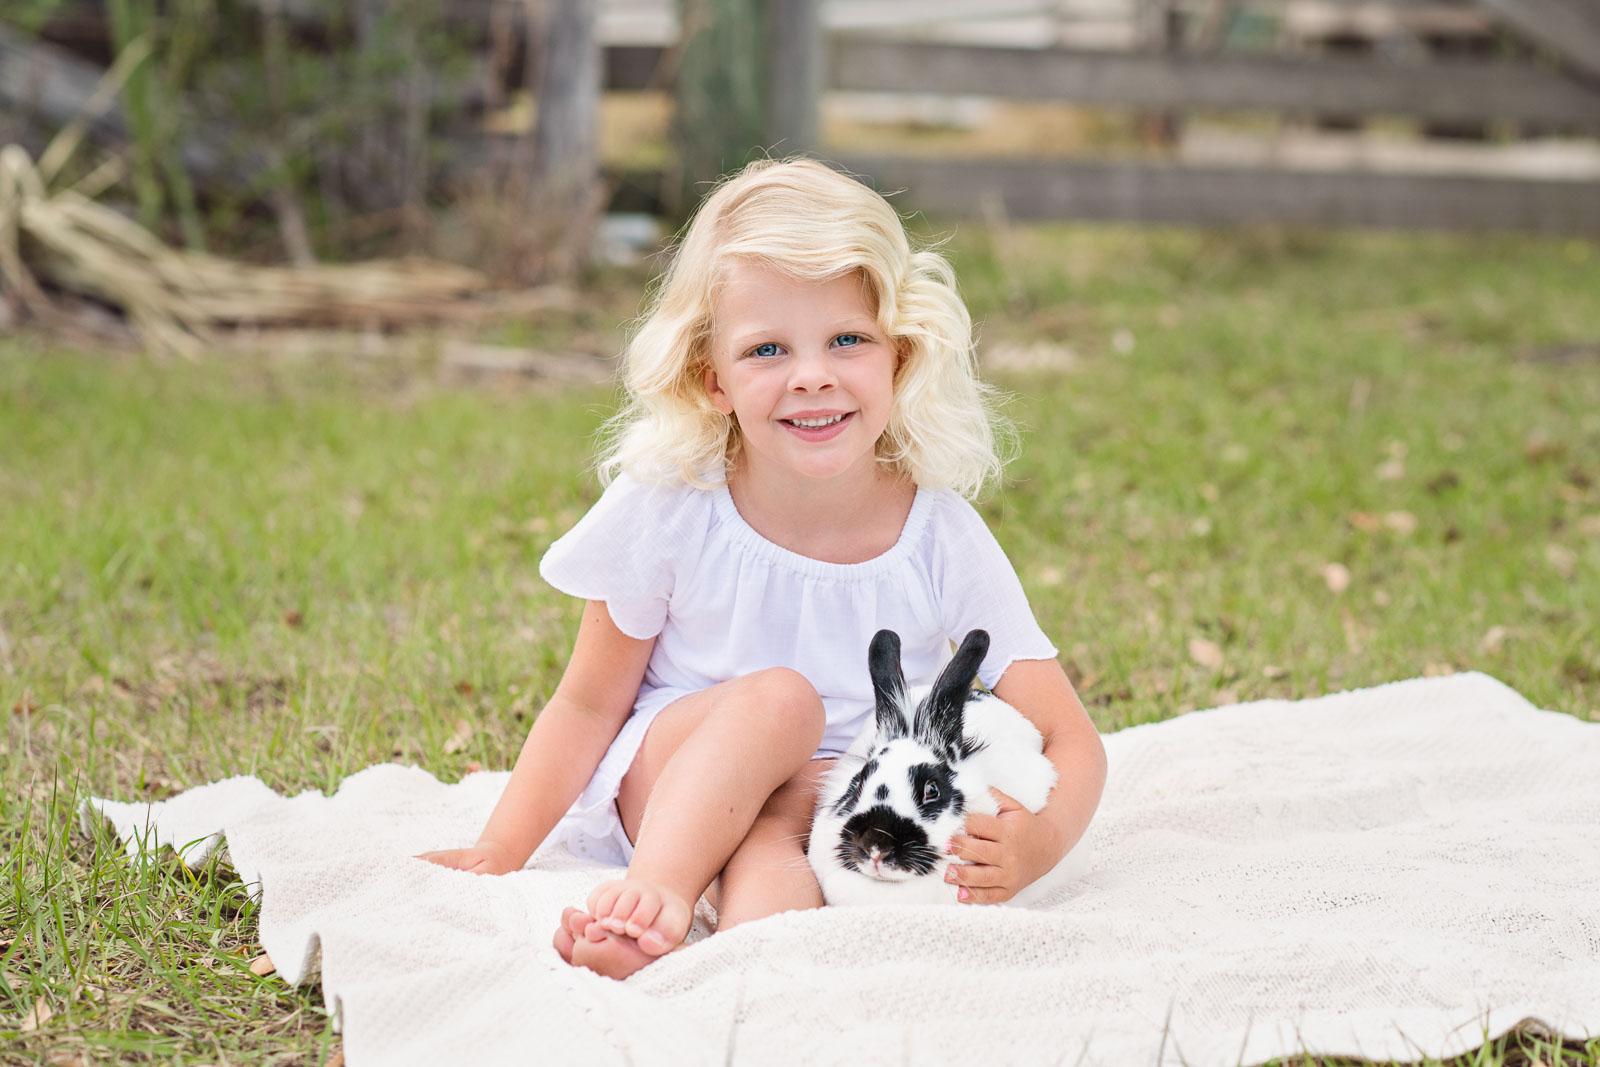 photo-sessions-children-animals-01-3.jpg